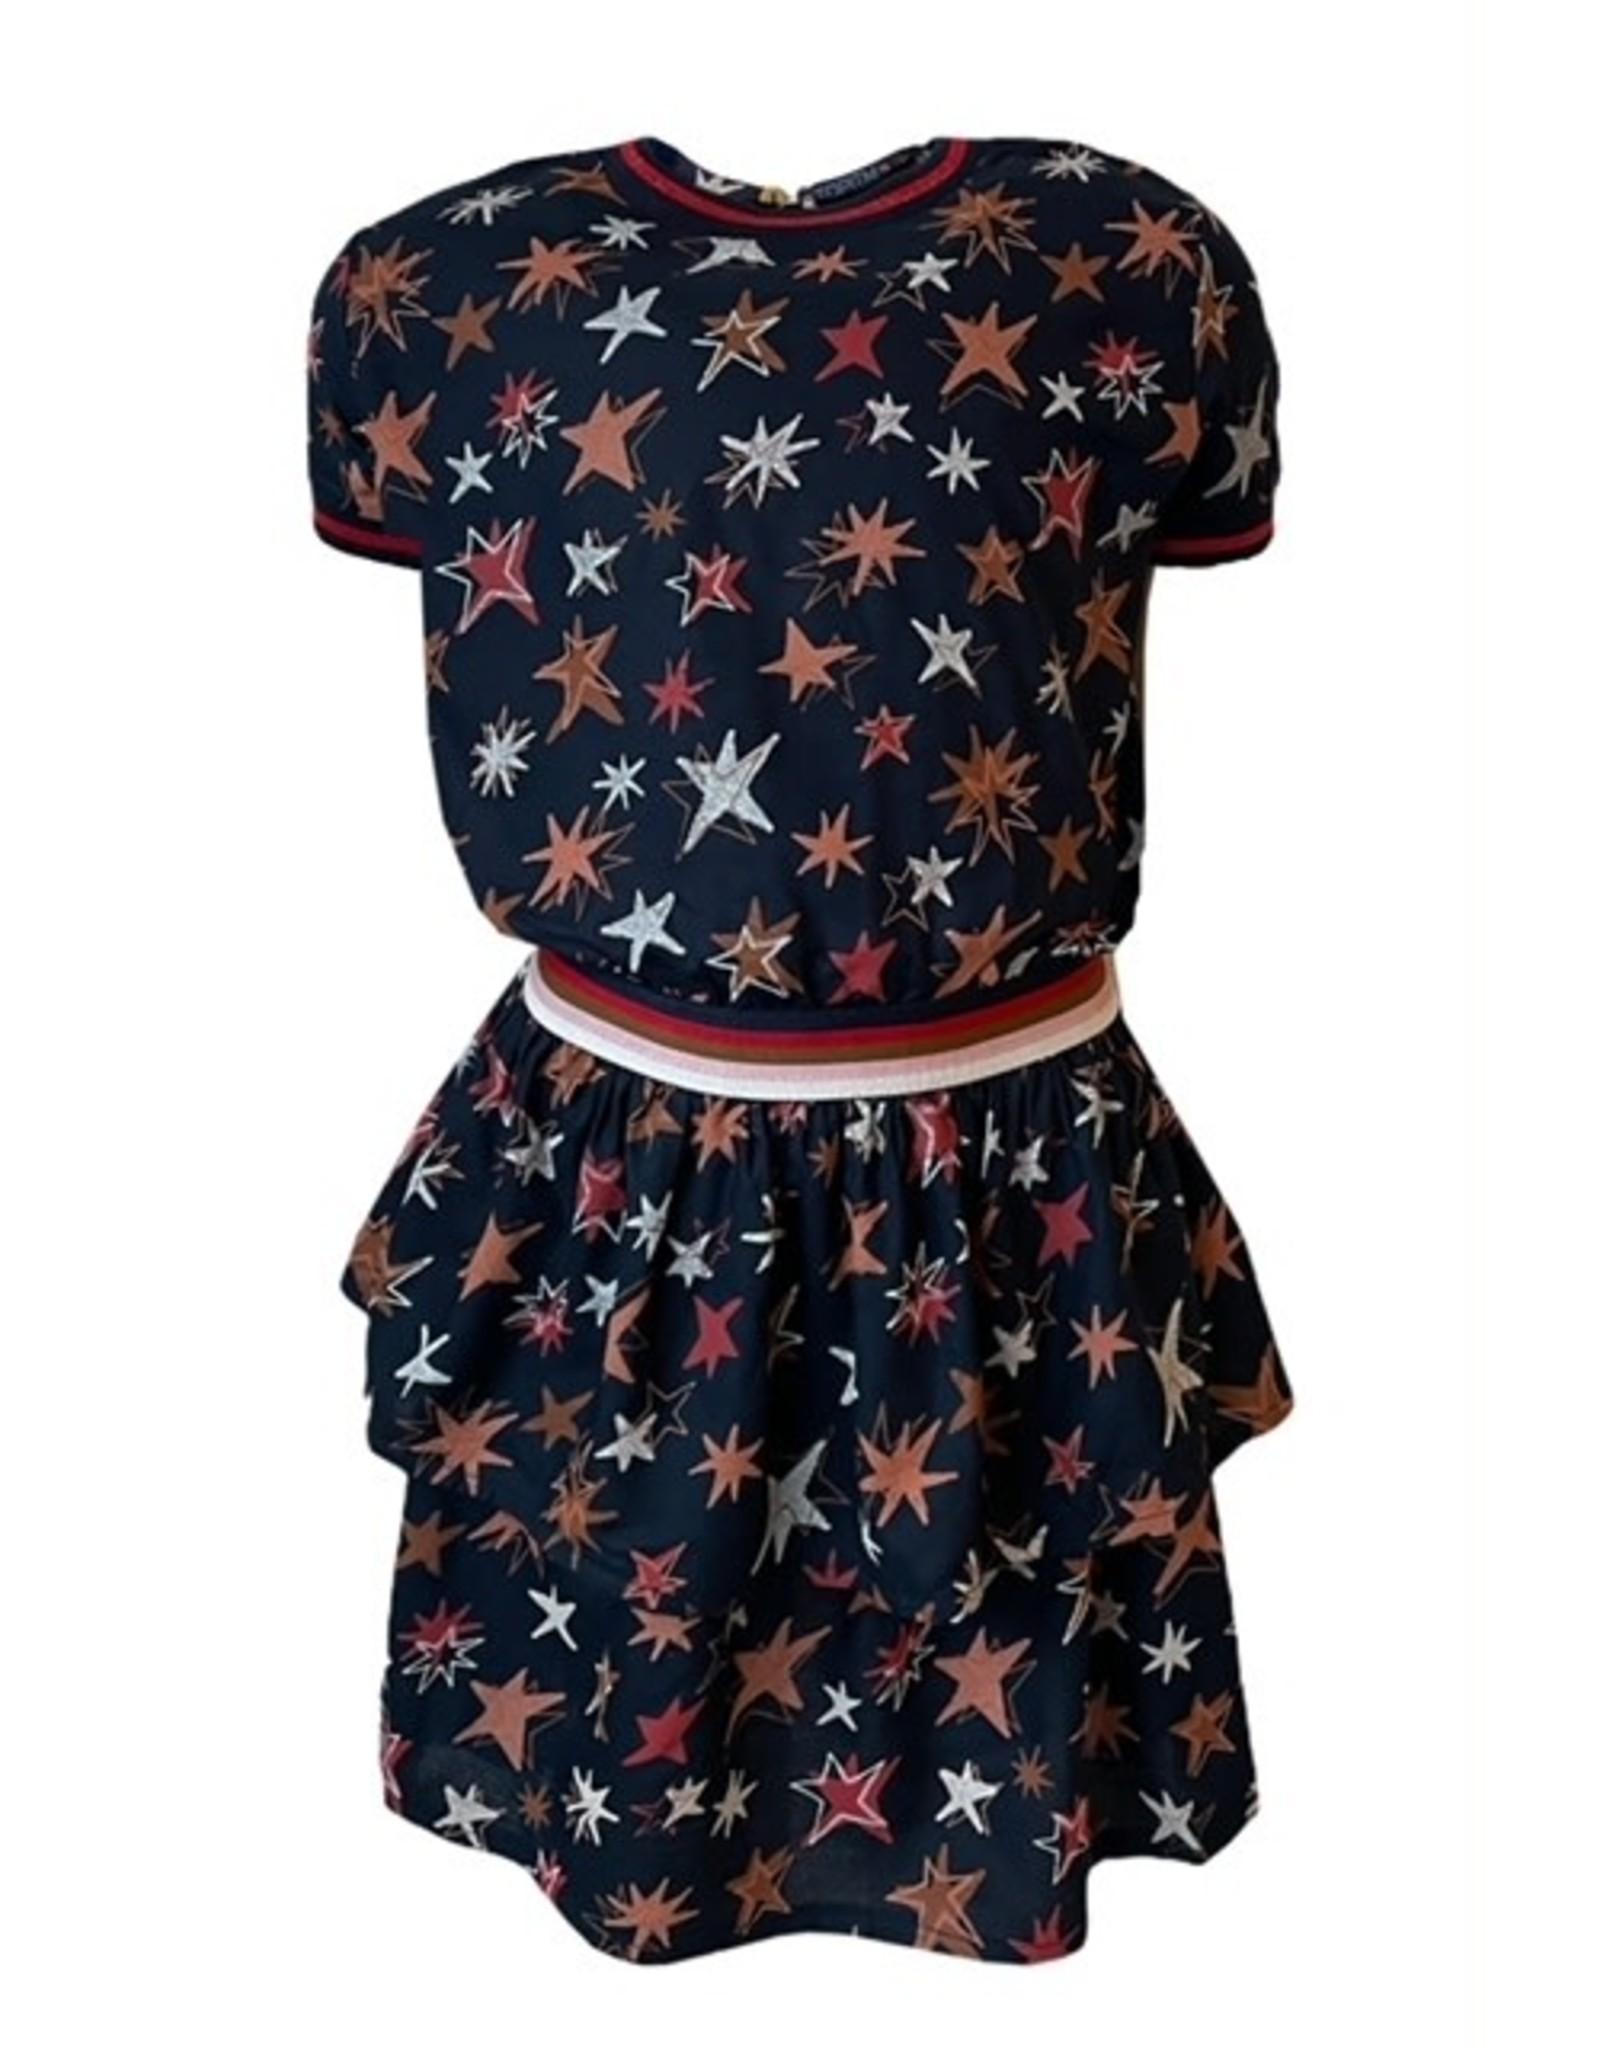 Topitm Allison Dress Dark blue AOP star